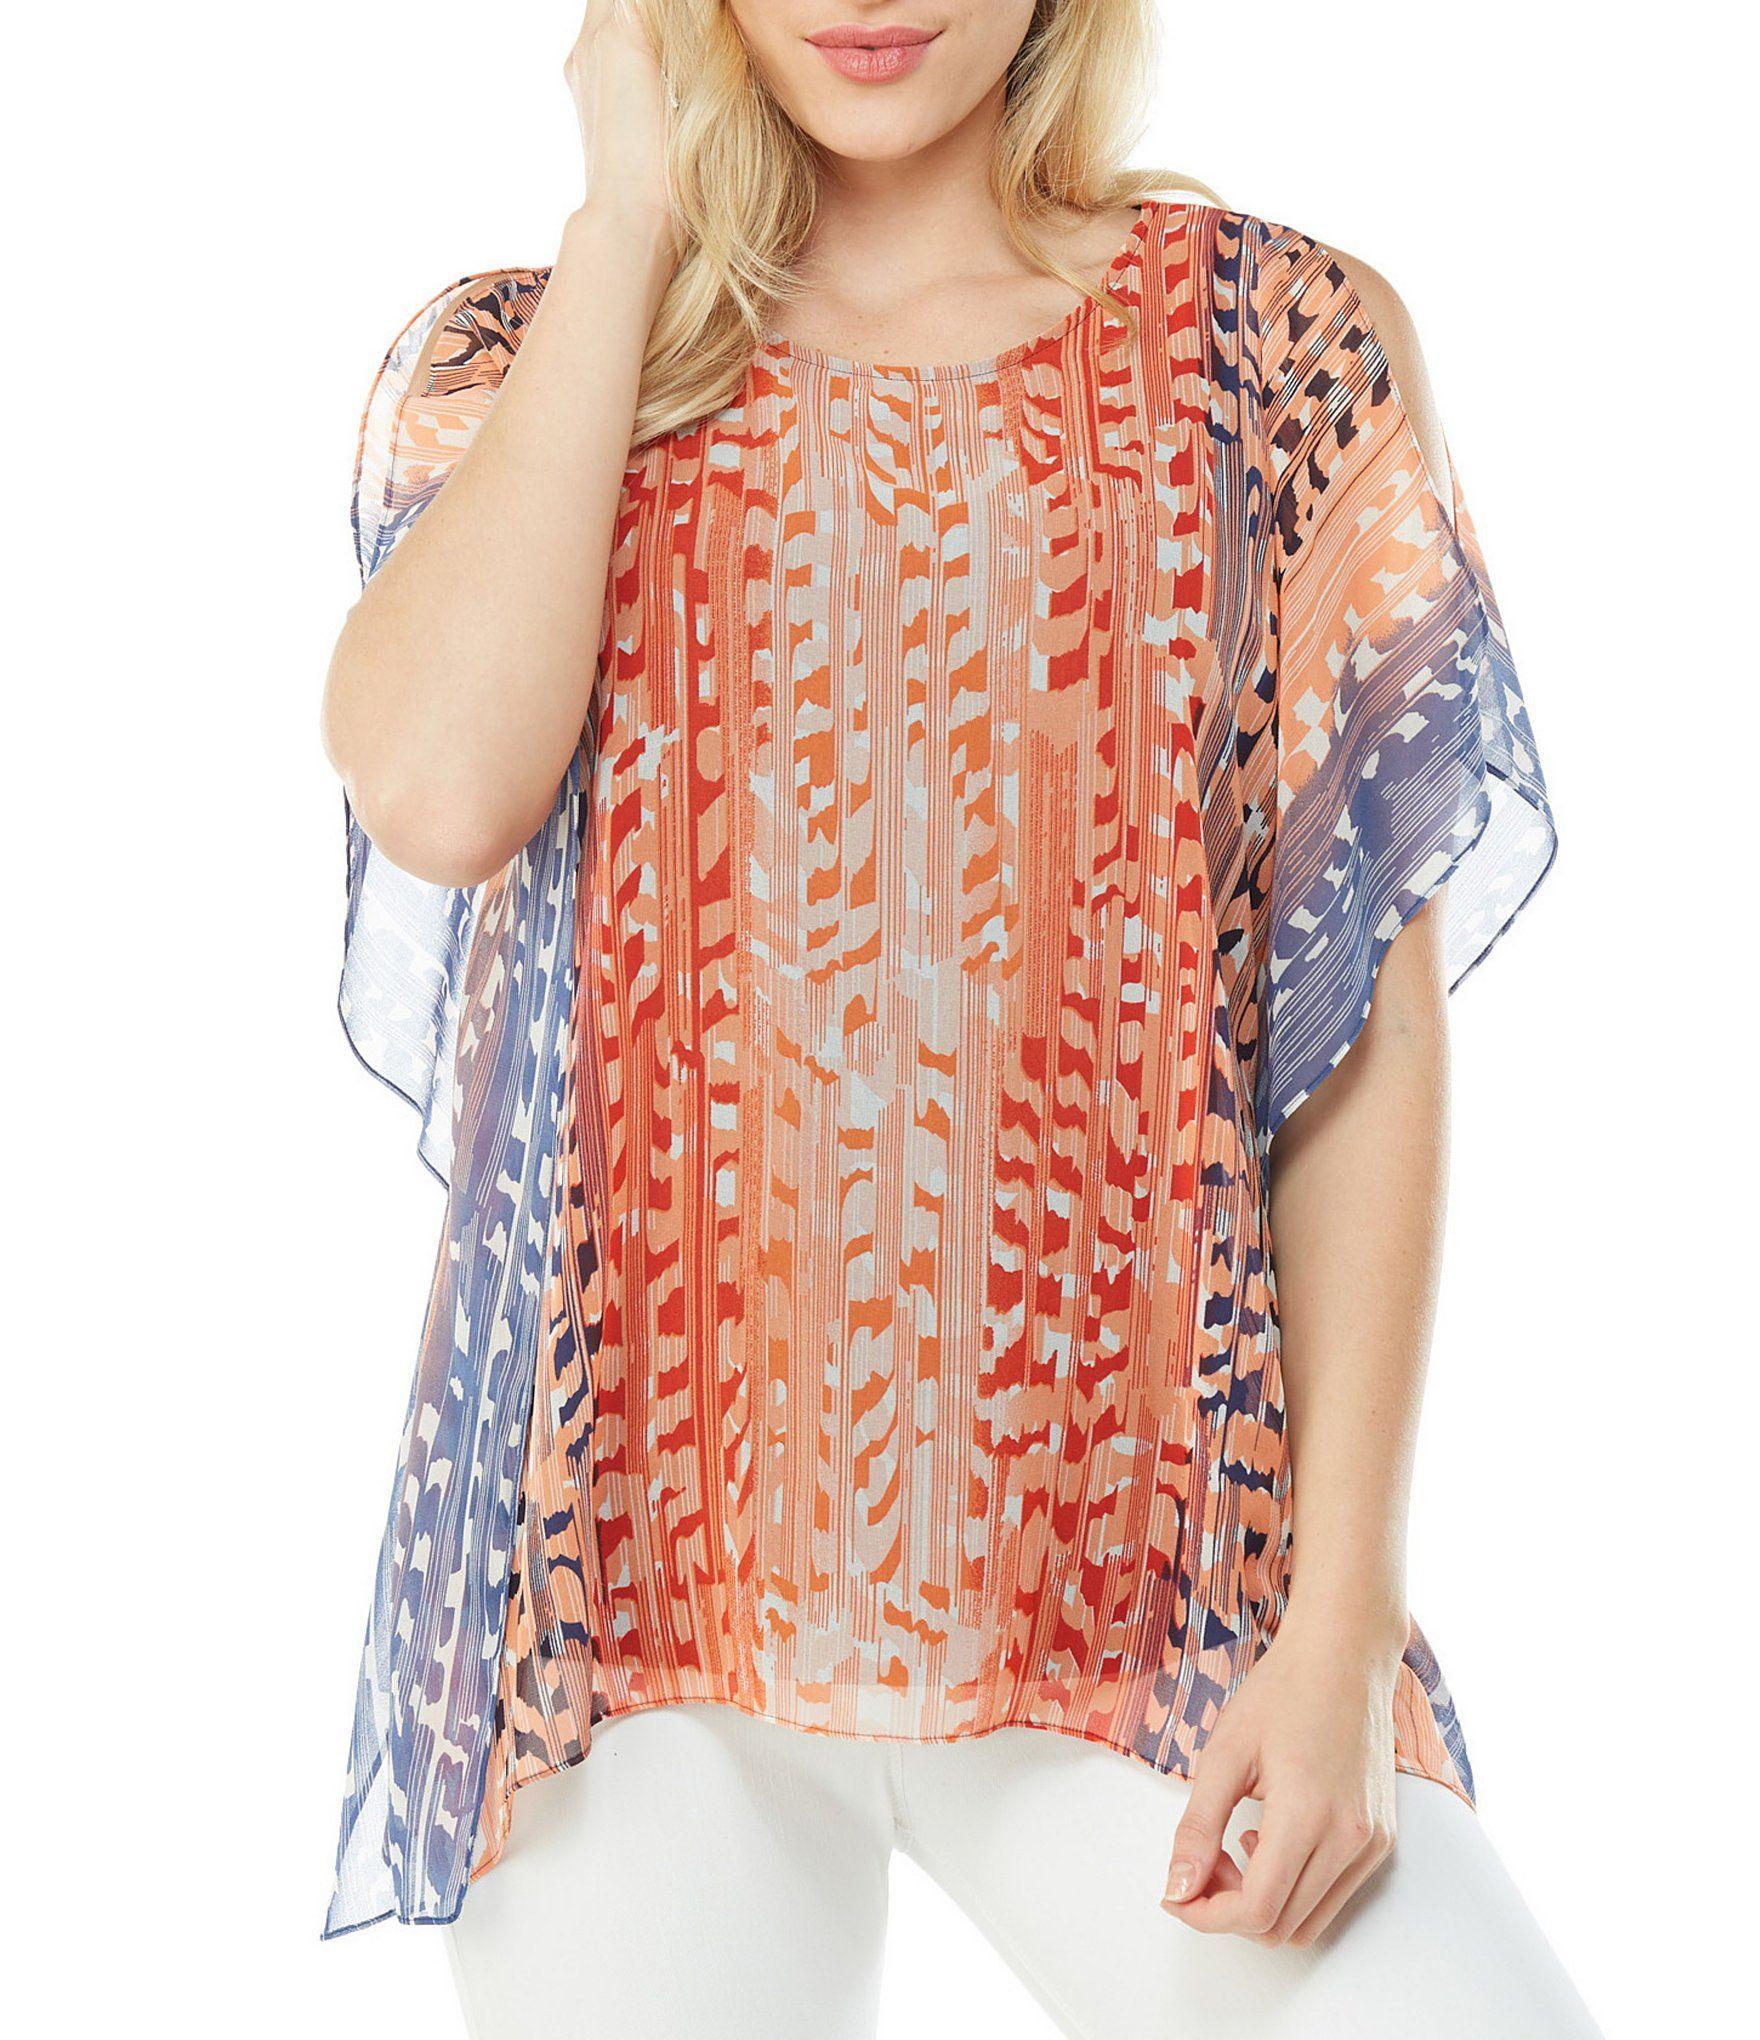 af7e643c66c Peter Nygard Cold Shoulder Kimono Top #Dillards   Stitch Fix   Tops ...